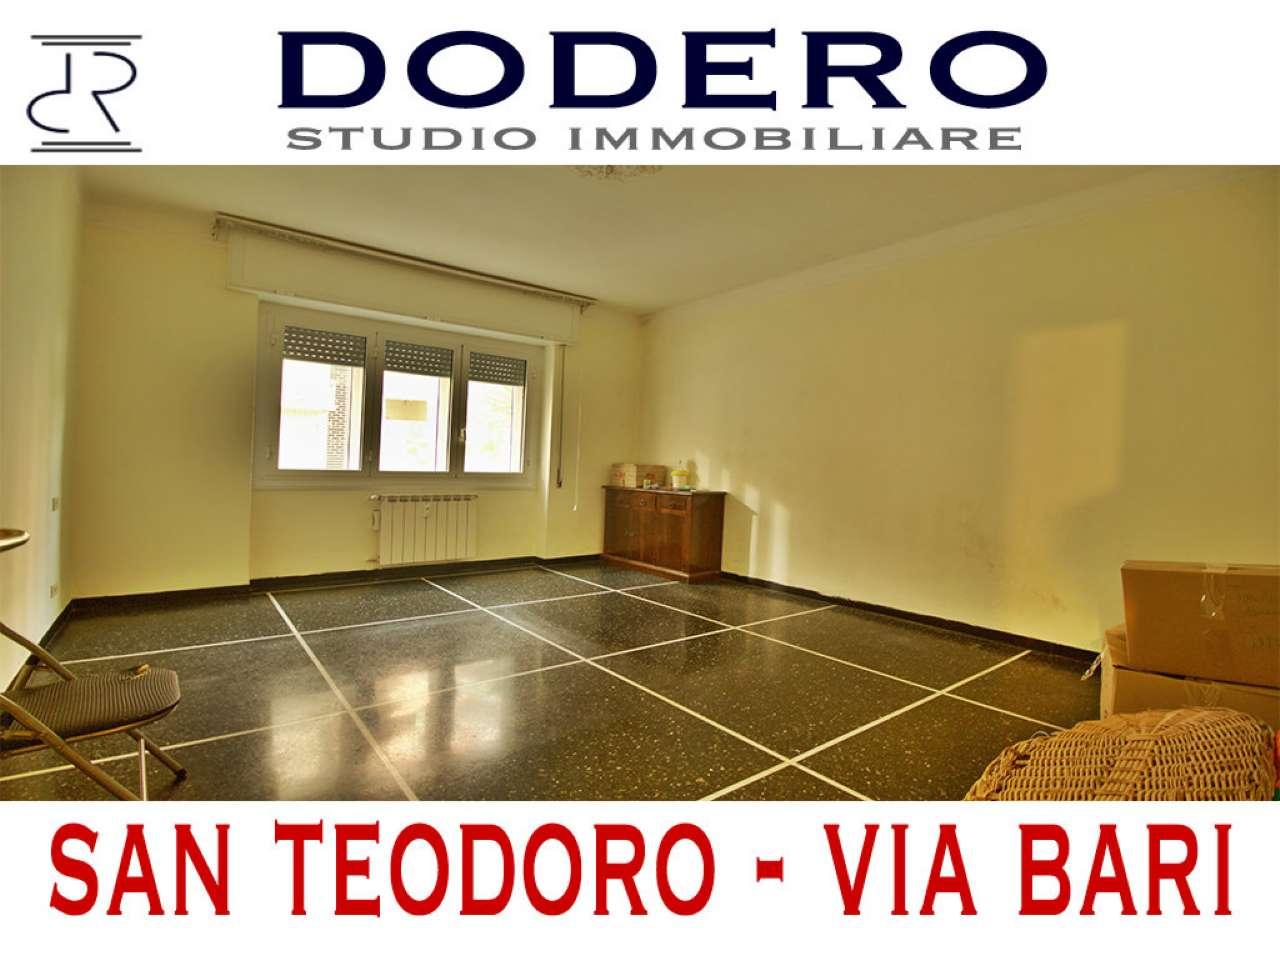 Foto 1 di Appartamento via Via Bari 00, Genova (zona San Teodoro)